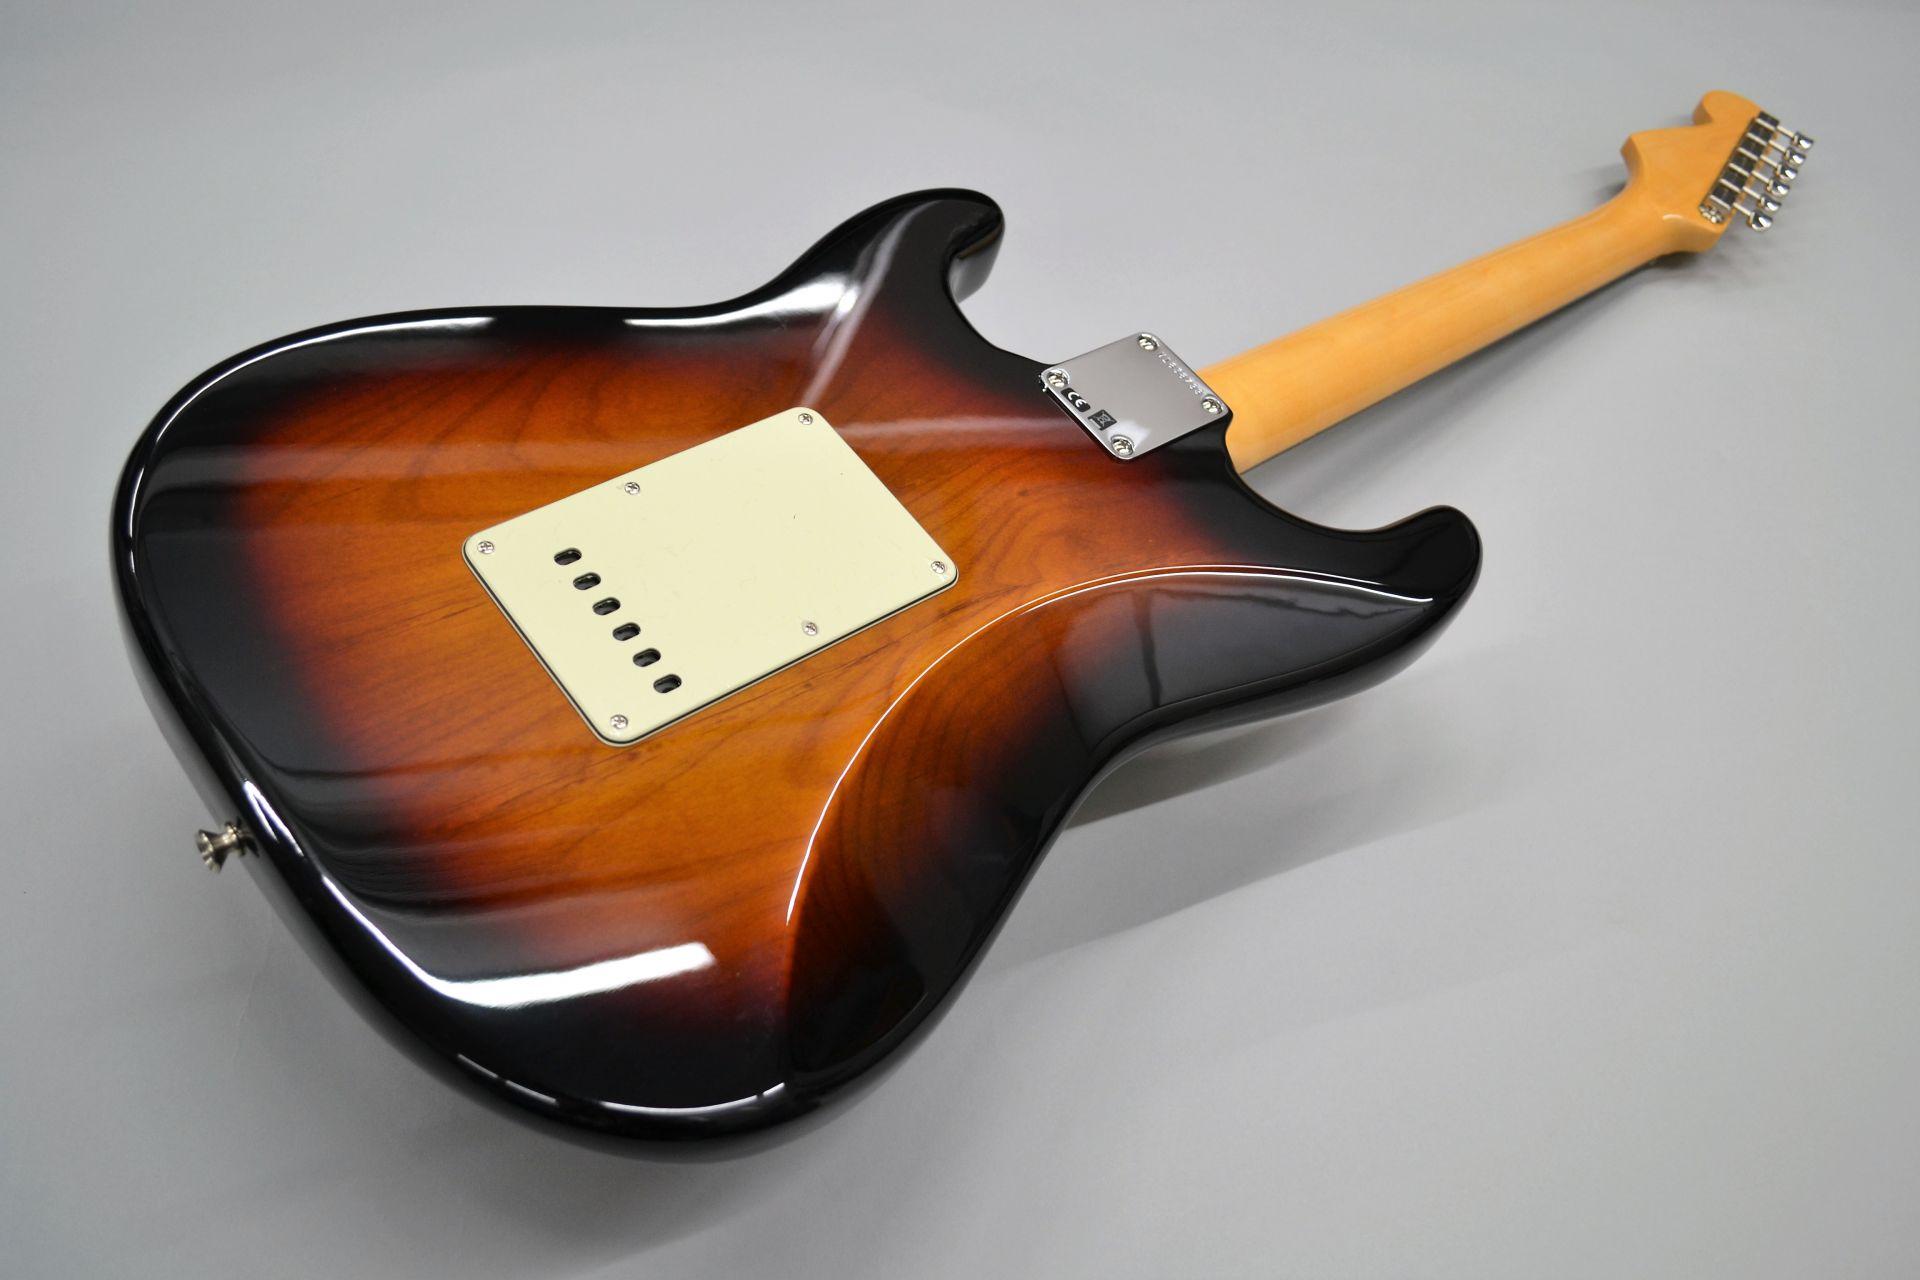 American Original '60s Stratocaster 3-Color Sunburst ストラトキャスターのボディバック-アップ画像